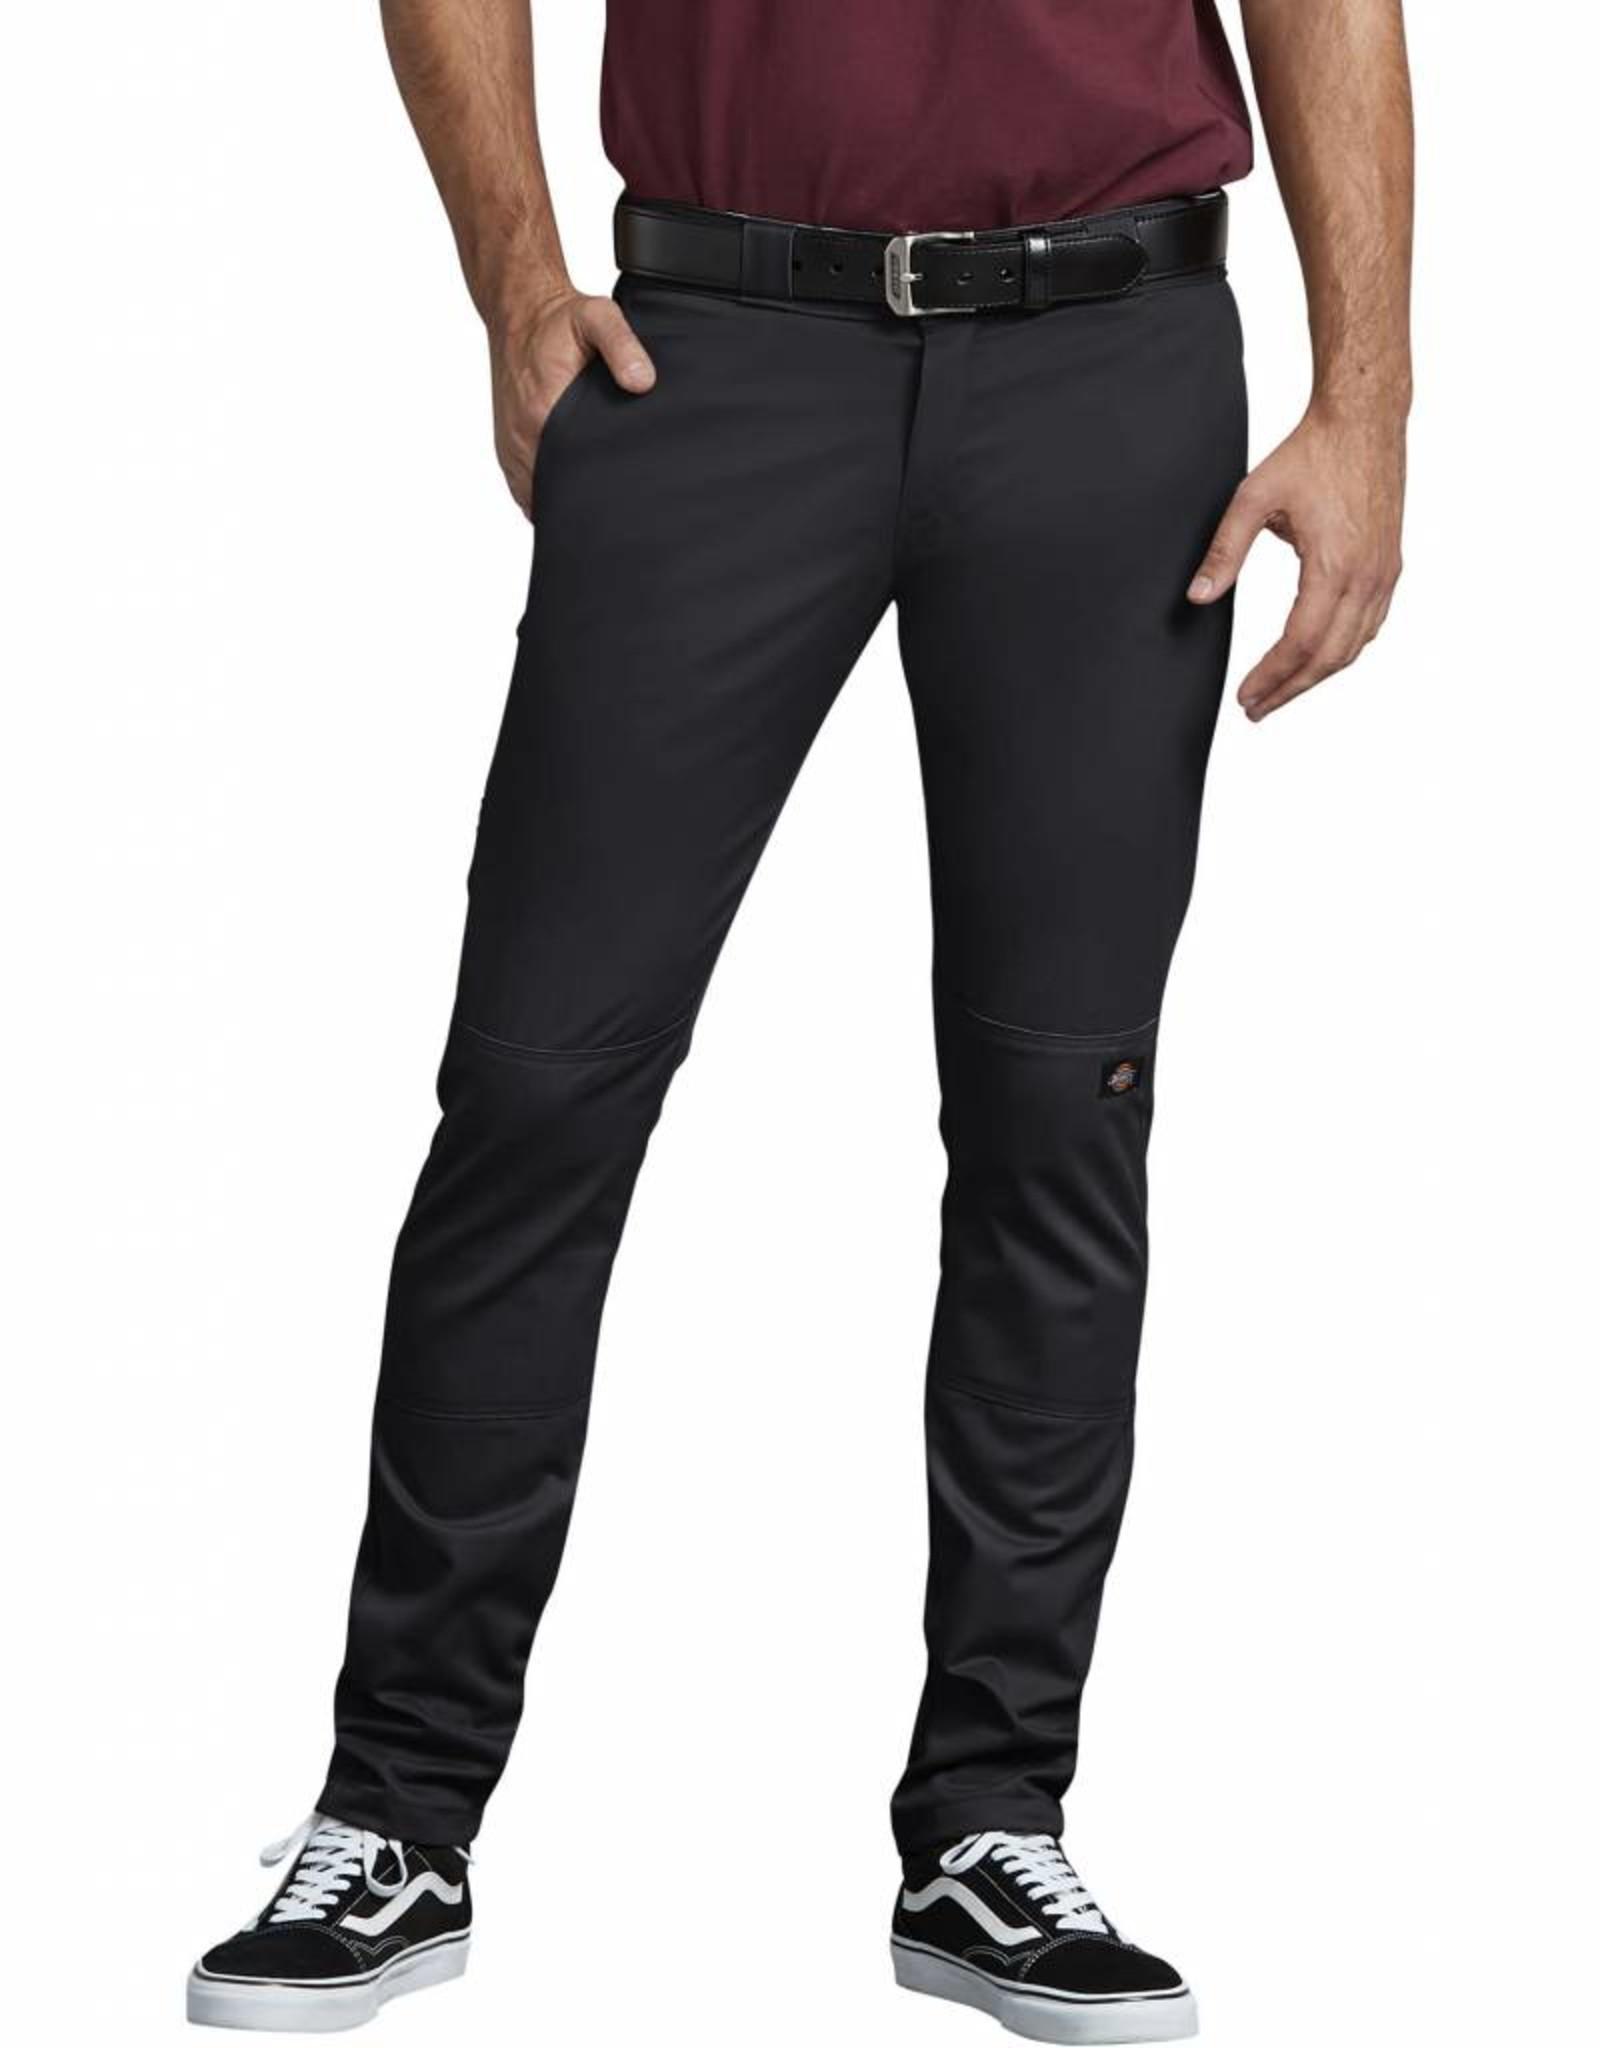 DICKIES Double Knee Straight Leg Skinny Fit Pant WP811